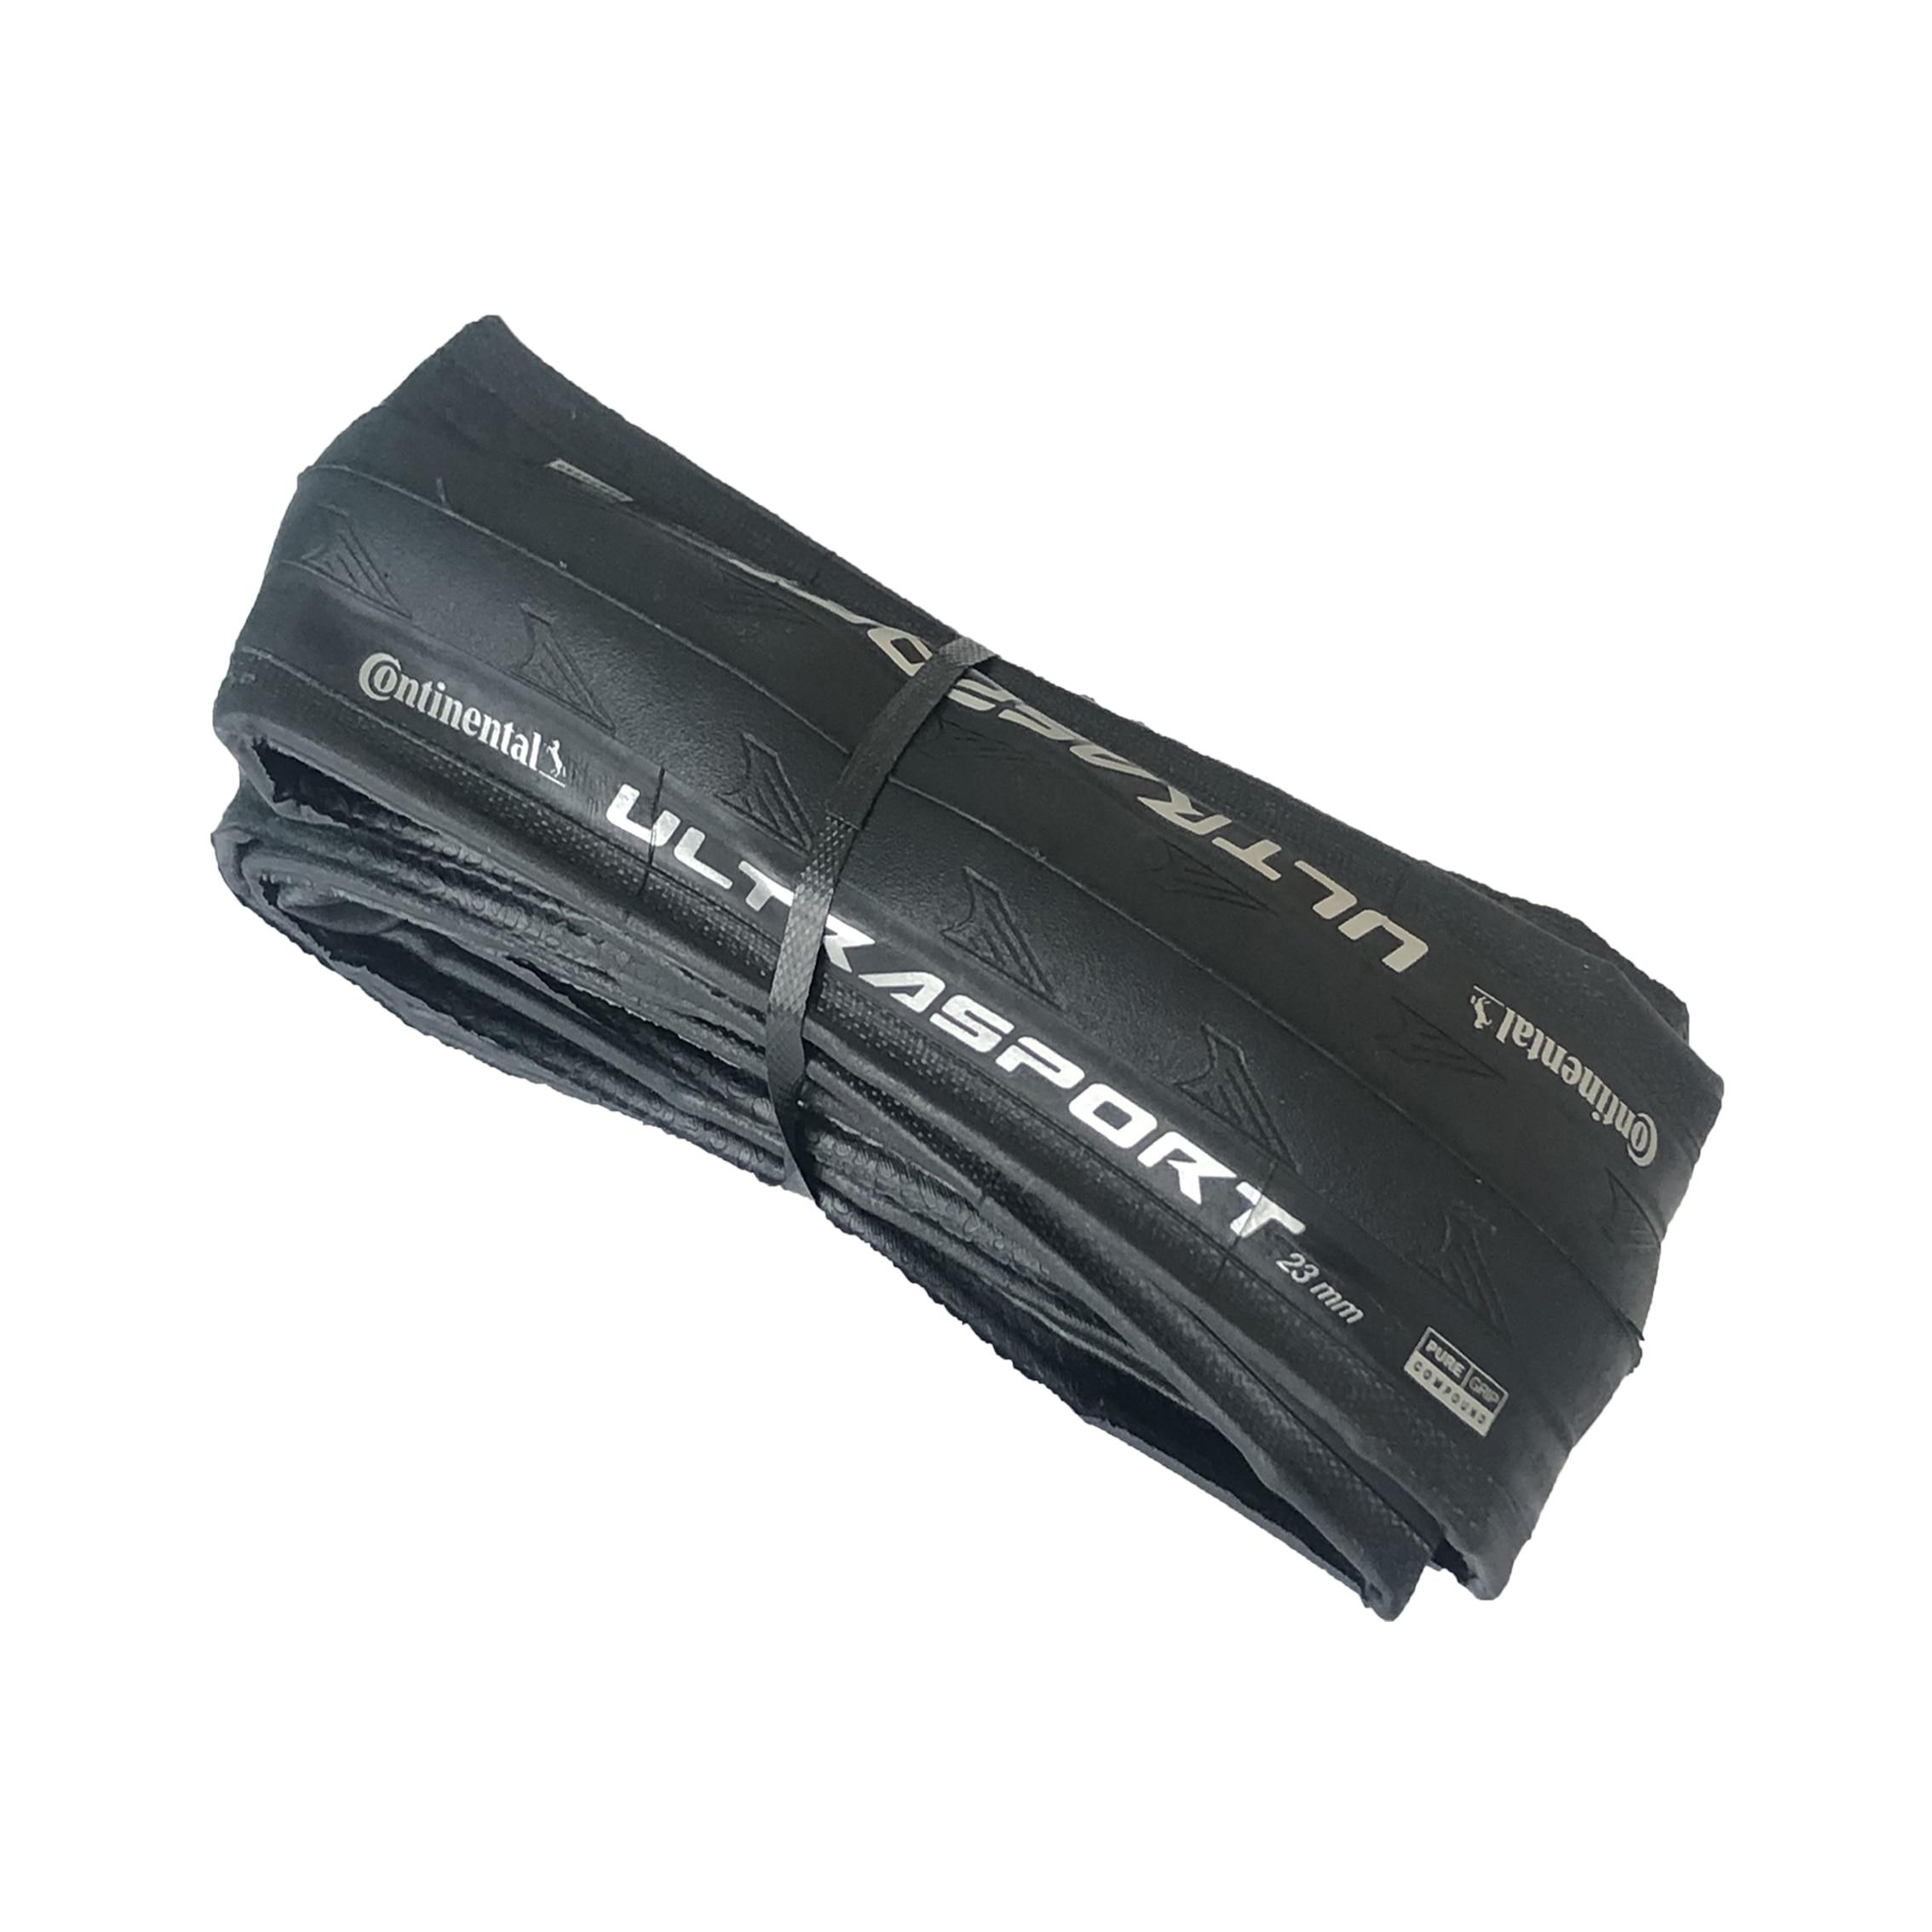 Continental Grand Sport course Ultra sport route vélo pneus 700c× 25 700 × 28 700C pneus route vélo pneu 700 28c